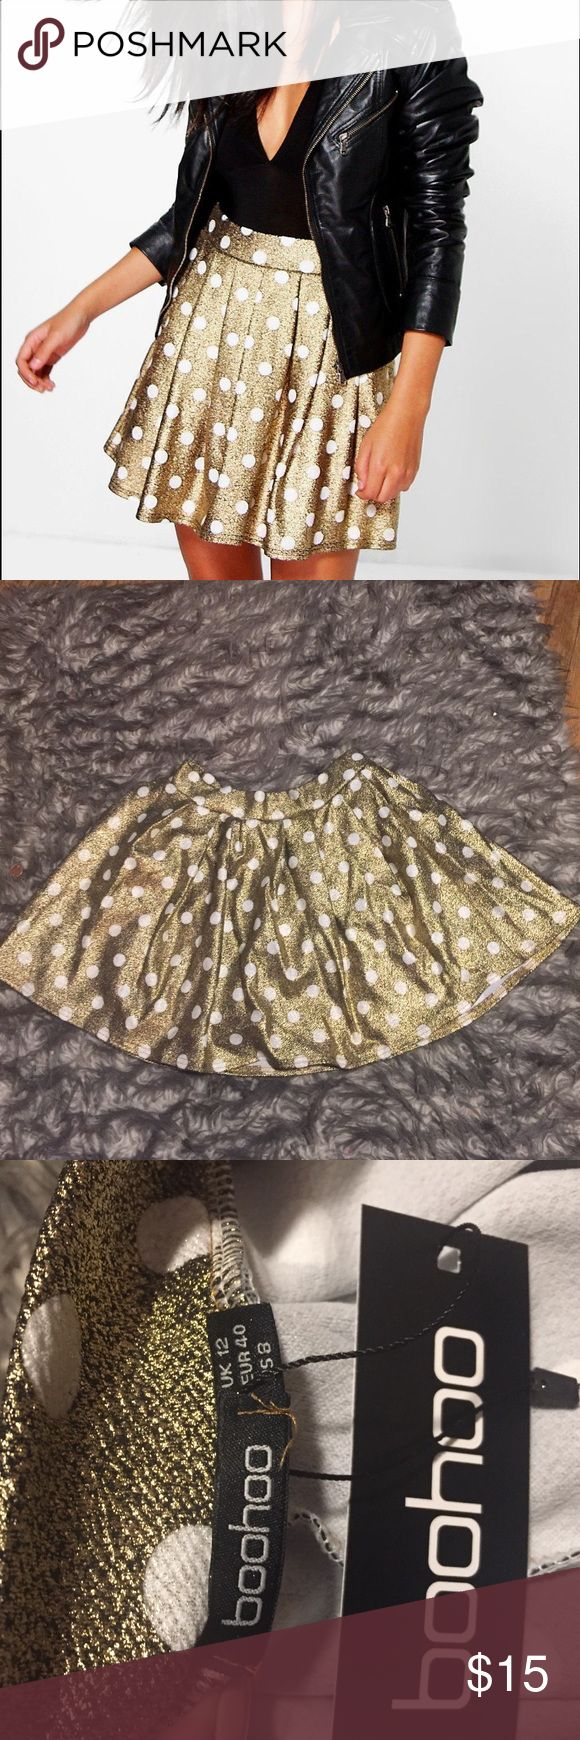 "Metallic polka dot skater skirt NWT- from Boohoo site: Fabric: 95% Polyester, 5% Elastane. Flat Measurement: Total Length 41cm/16"". Waist 33cm/13"". Hem Width 52cm/20.5"". Elasticated Waist. Machine Washable. Measured on a UK Size 10. Model Wears UK Size 10. Boohoo Skirts Circle & Skater"